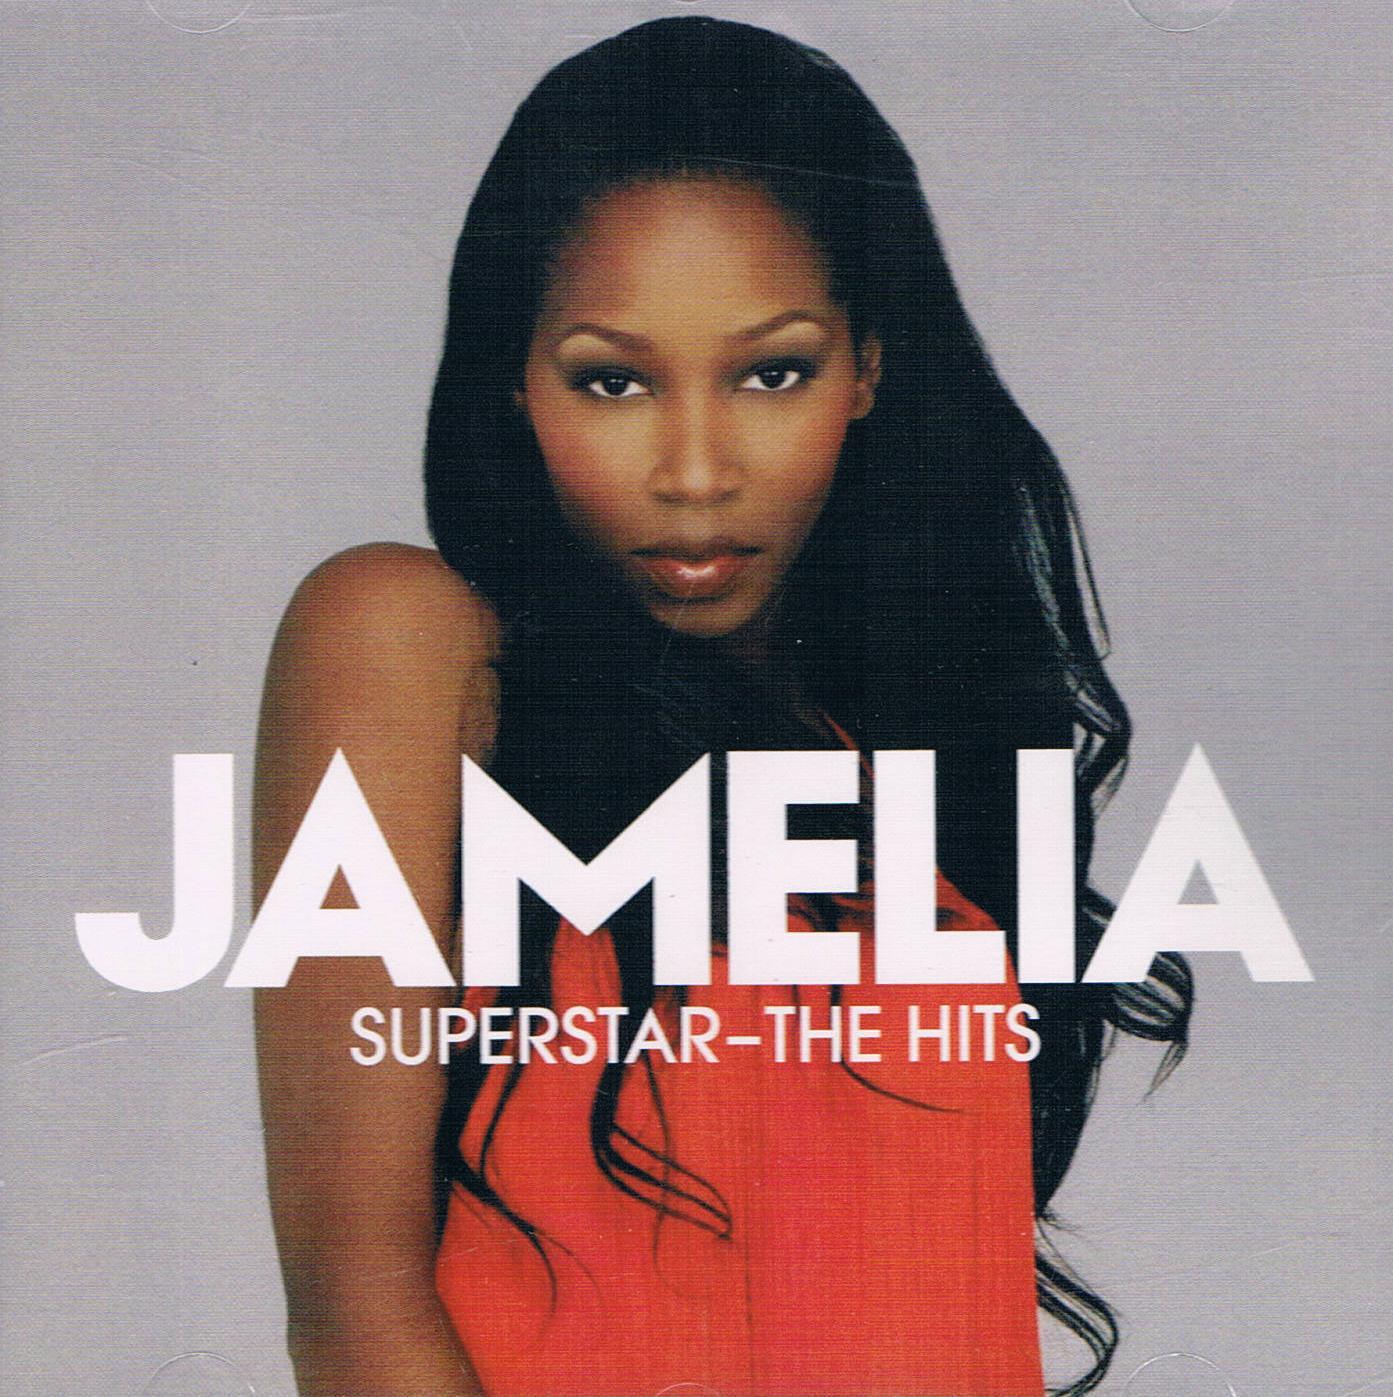 http://2.bp.blogspot.com/_lqmD_bfshgM/S_v77Usr7VI/AAAAAAAAAiA/LfzhpIqO9xA/s1600/JAMELIA,+SUPERSTAR-THE+HITS.jpg